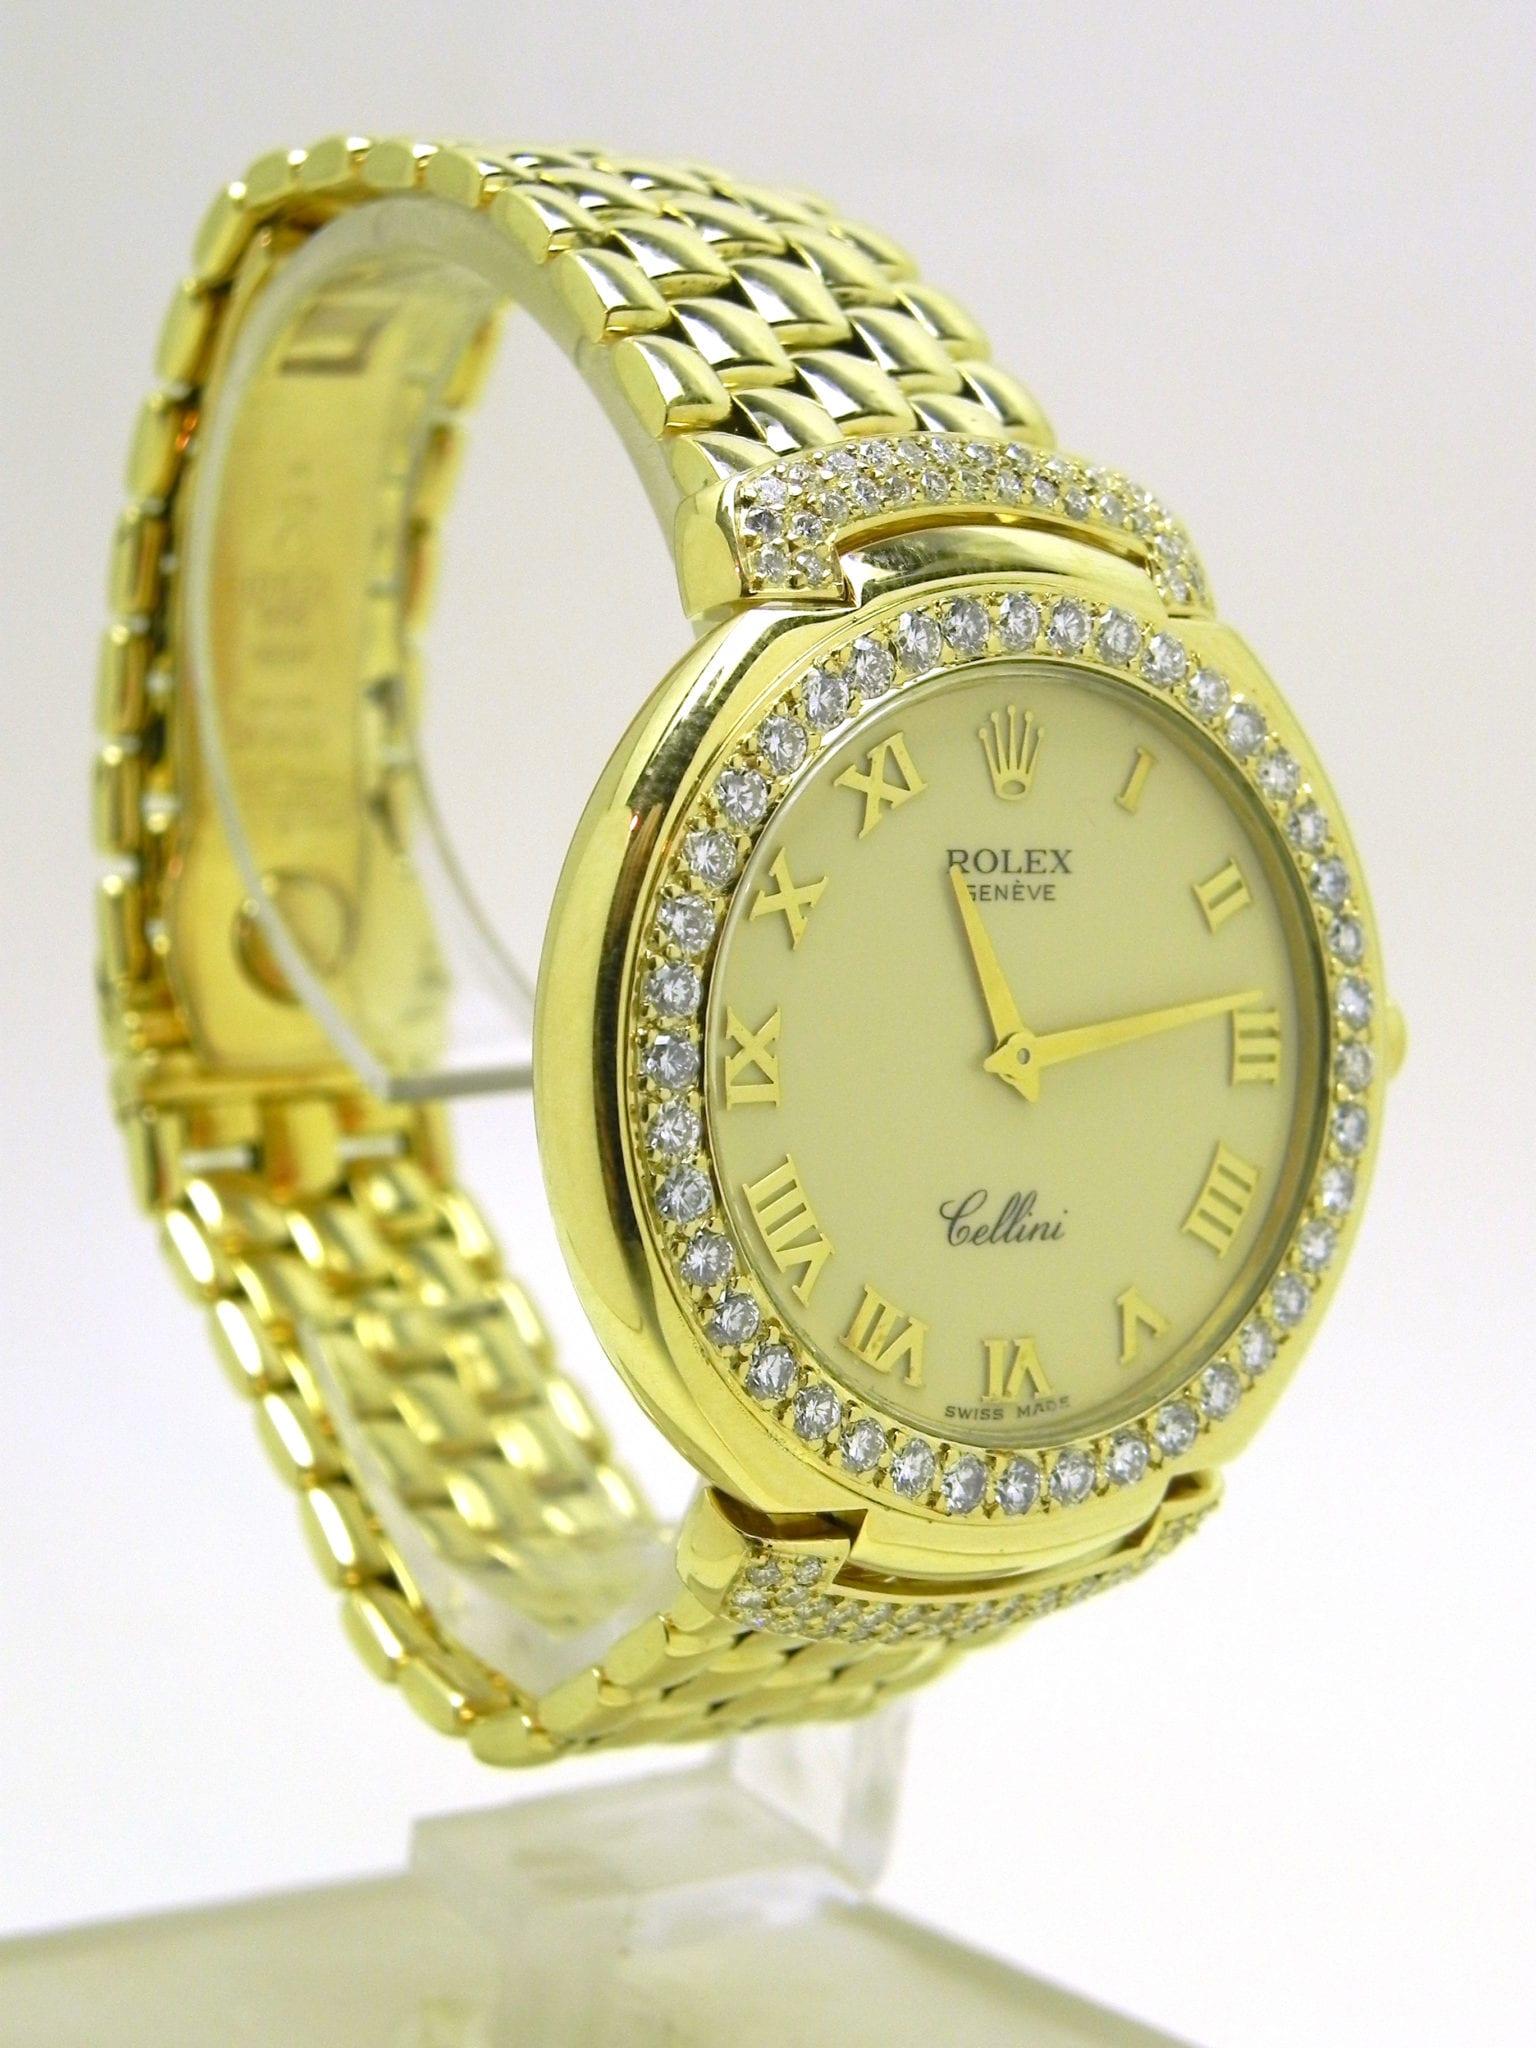 Gents Rolex Cellini Solid 18k Gold W Bracelet Wrist Watch